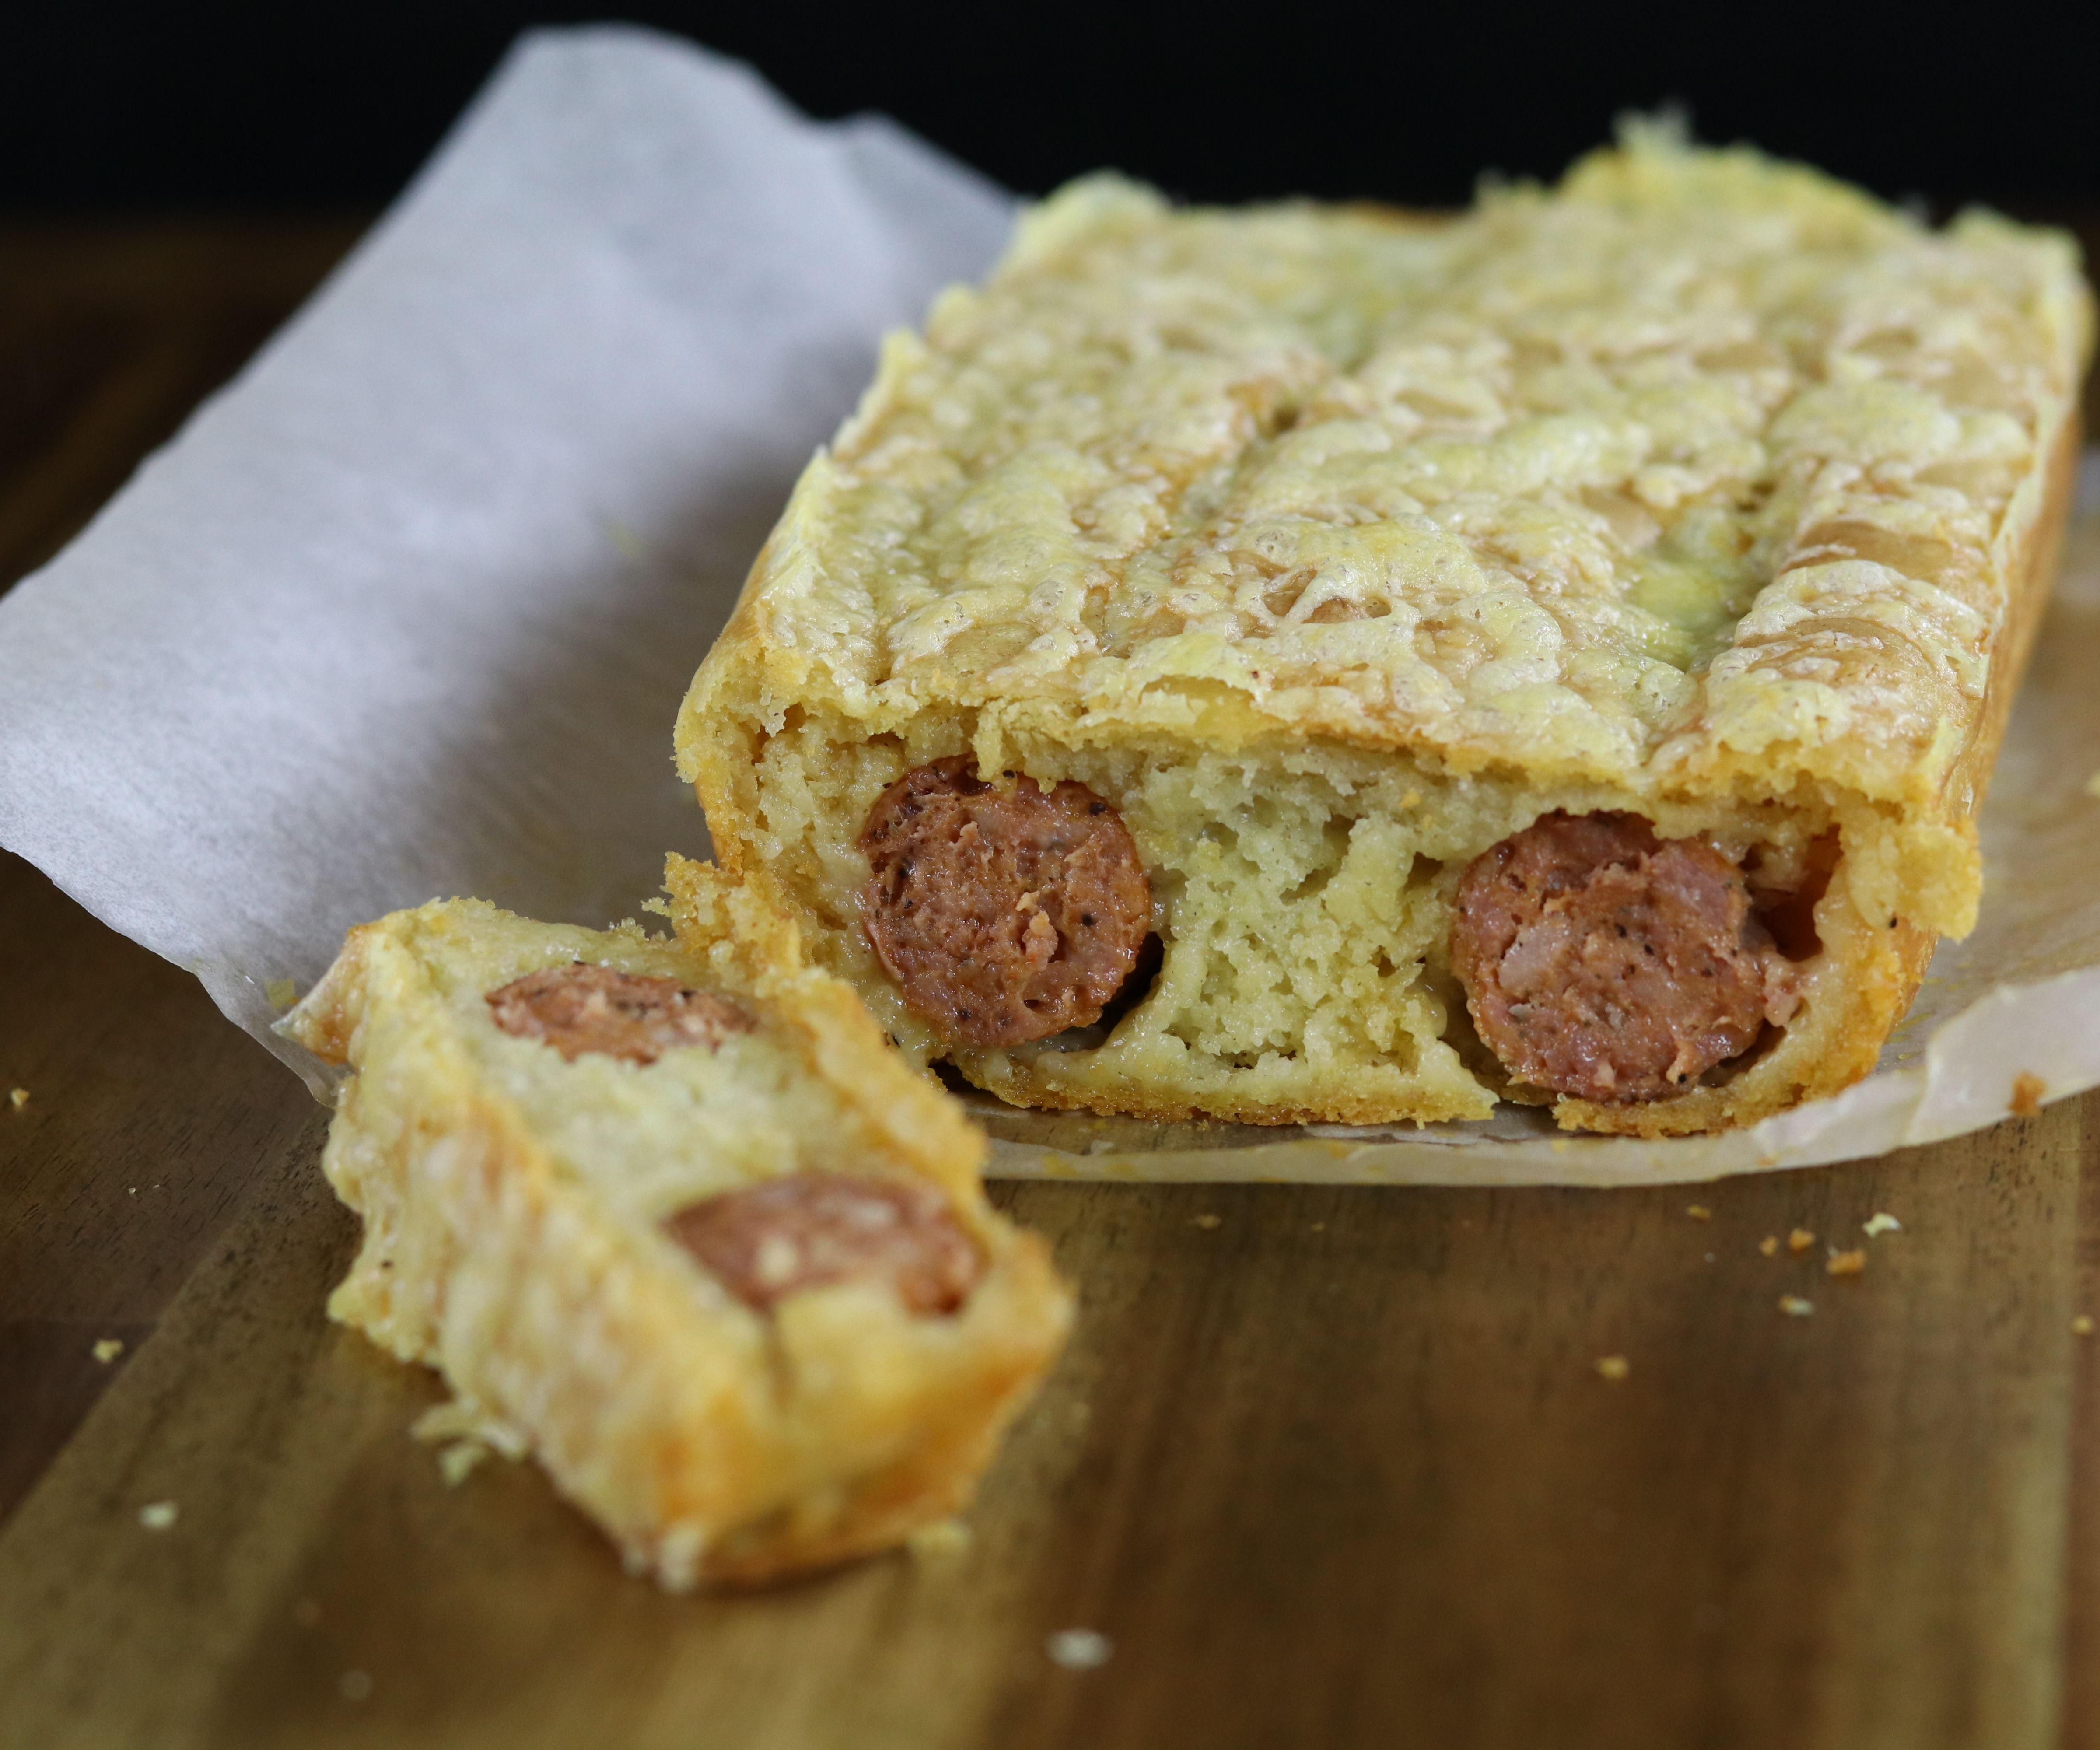 Double Dog (sausage stuffed bread)